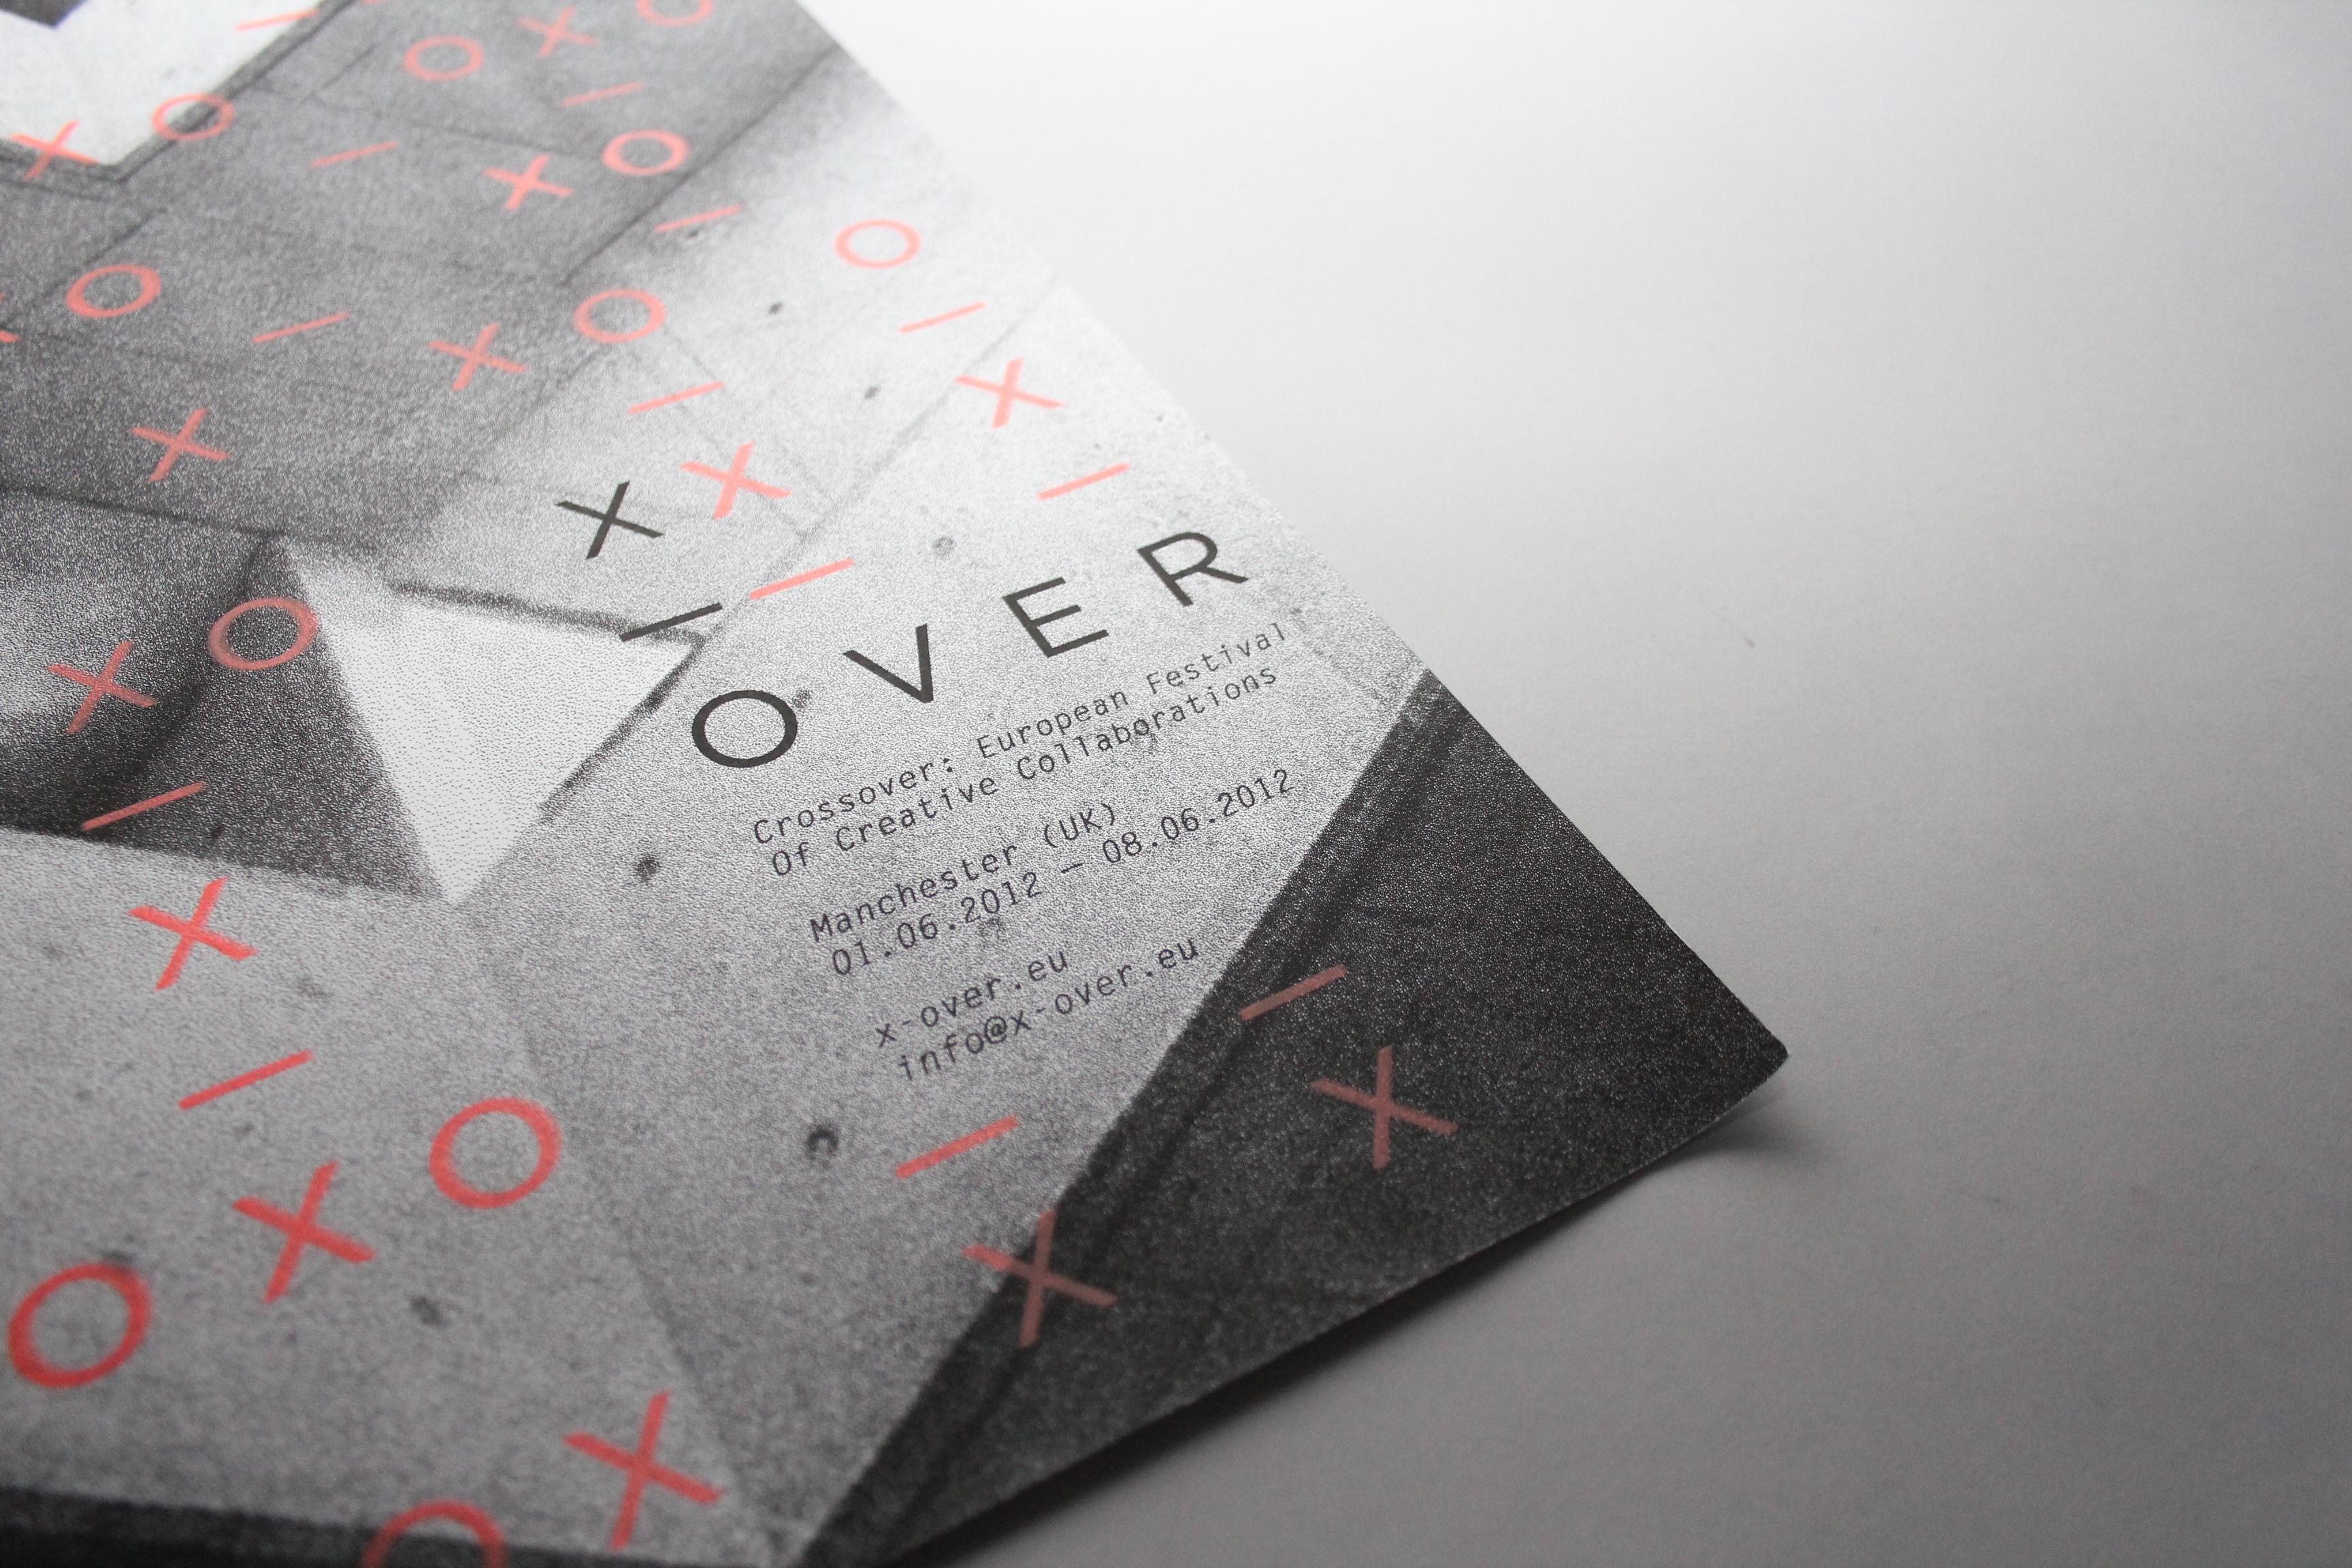 Crossover Festival: Branding & Promotion